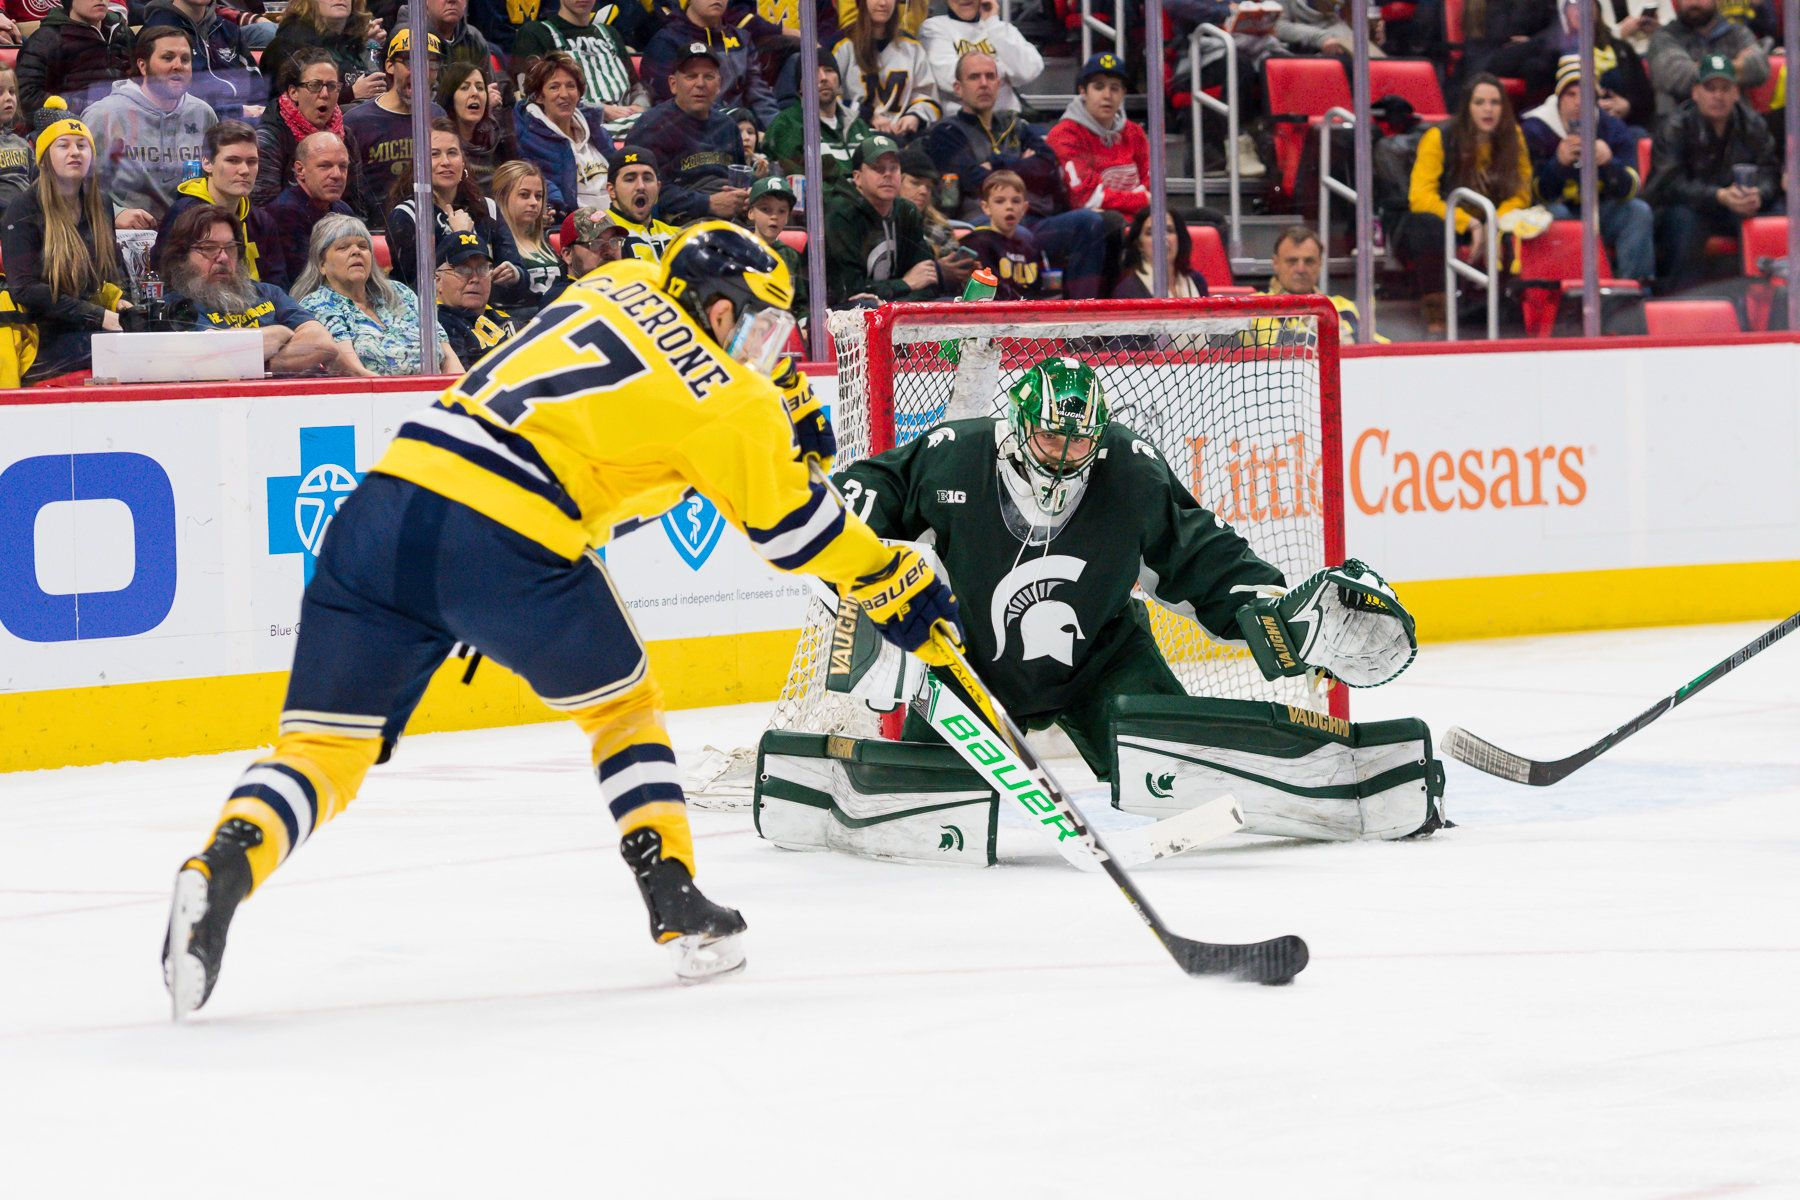 Michigan Edges Msu 3 2 In Duel In The D At Lca Wins Season Series Michigan Hockey Michigan College Hockey